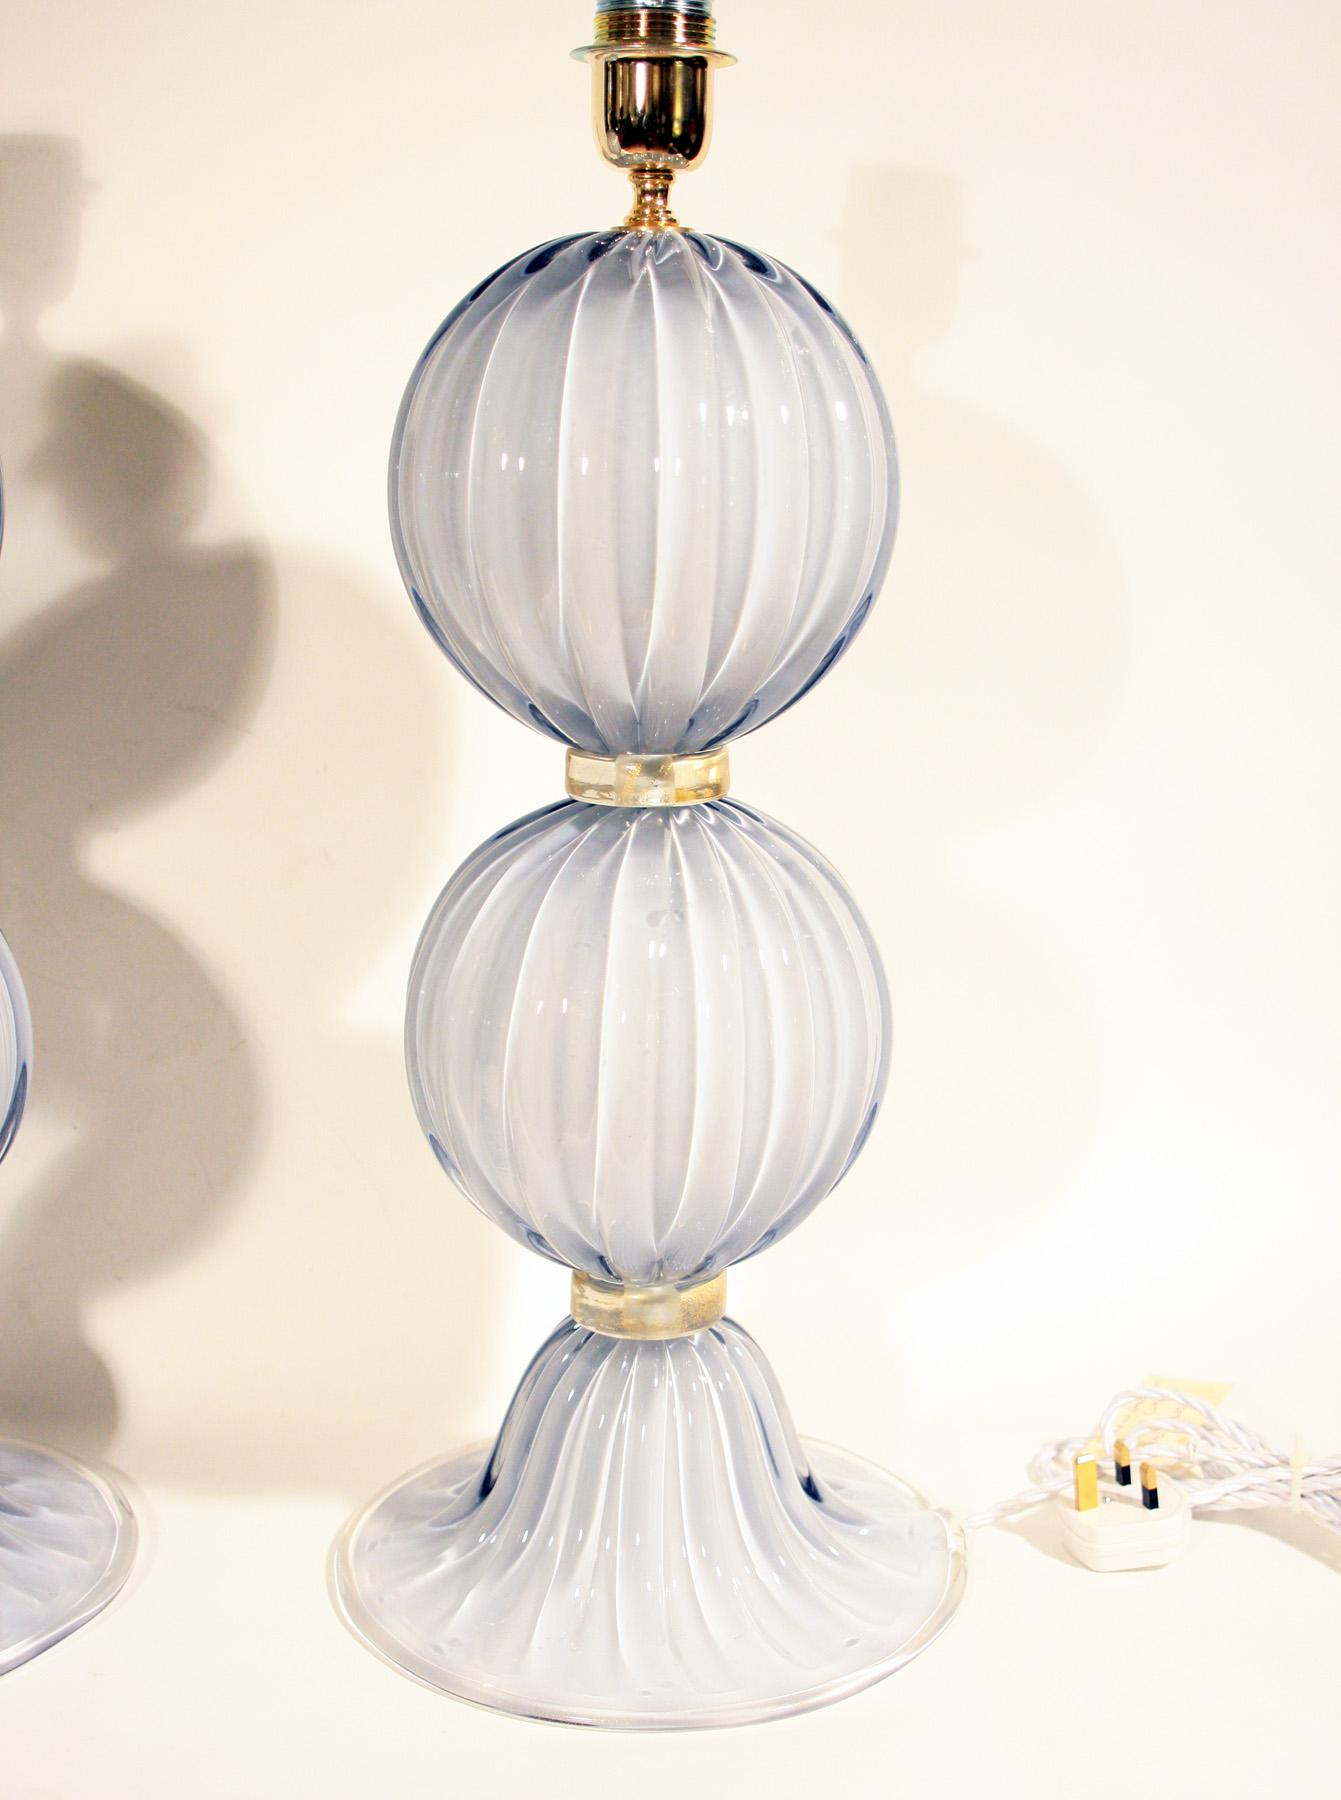 Alberto Dona Murano Globe Table Lamps   A Pair   Image 3 Of 3